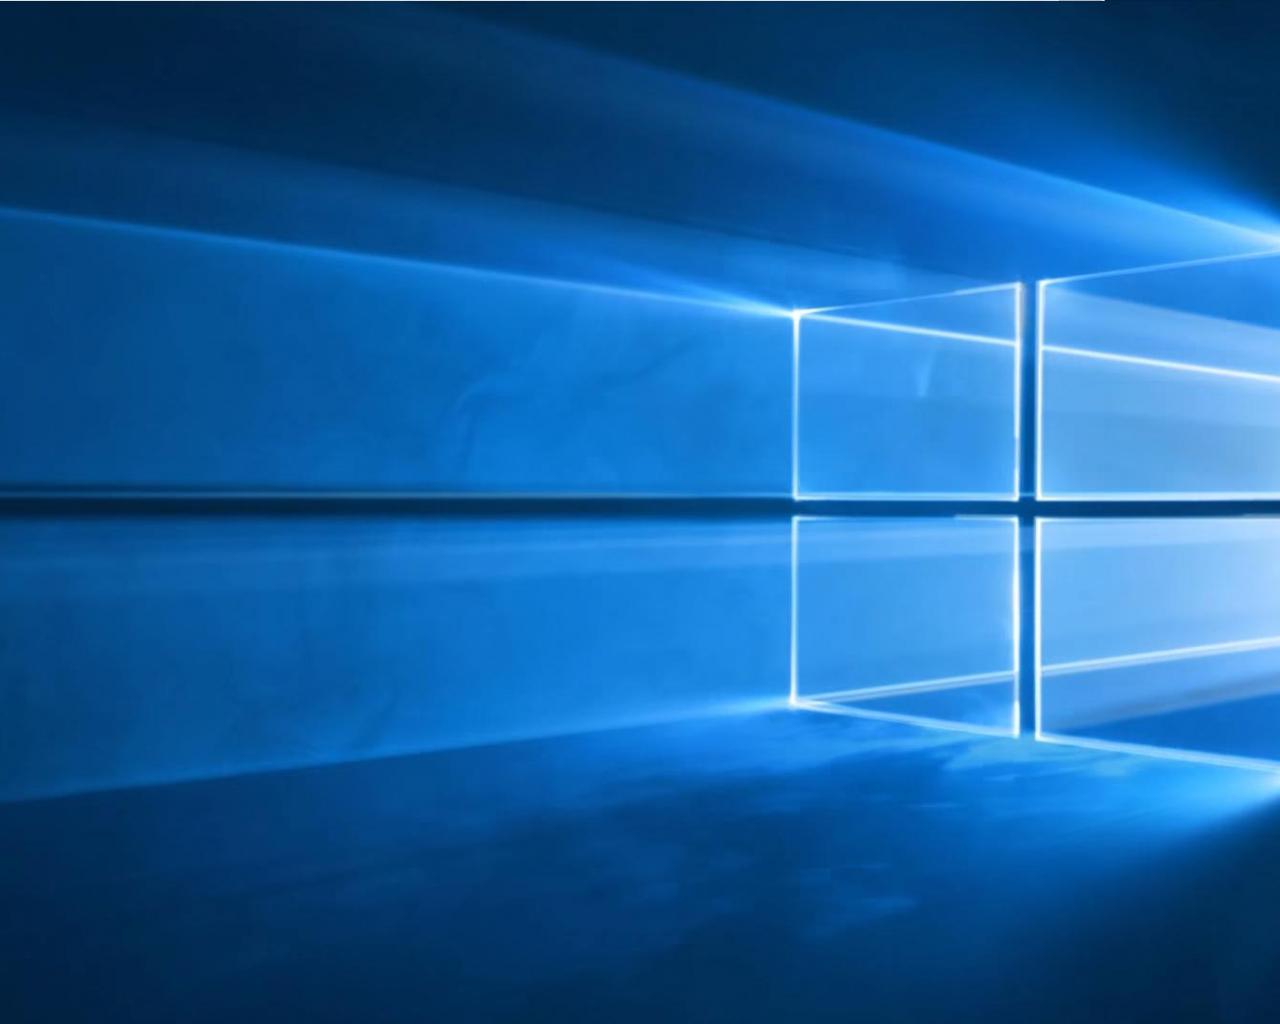 Free download Windows 10 Default Wallpaper NON HD Windows ...